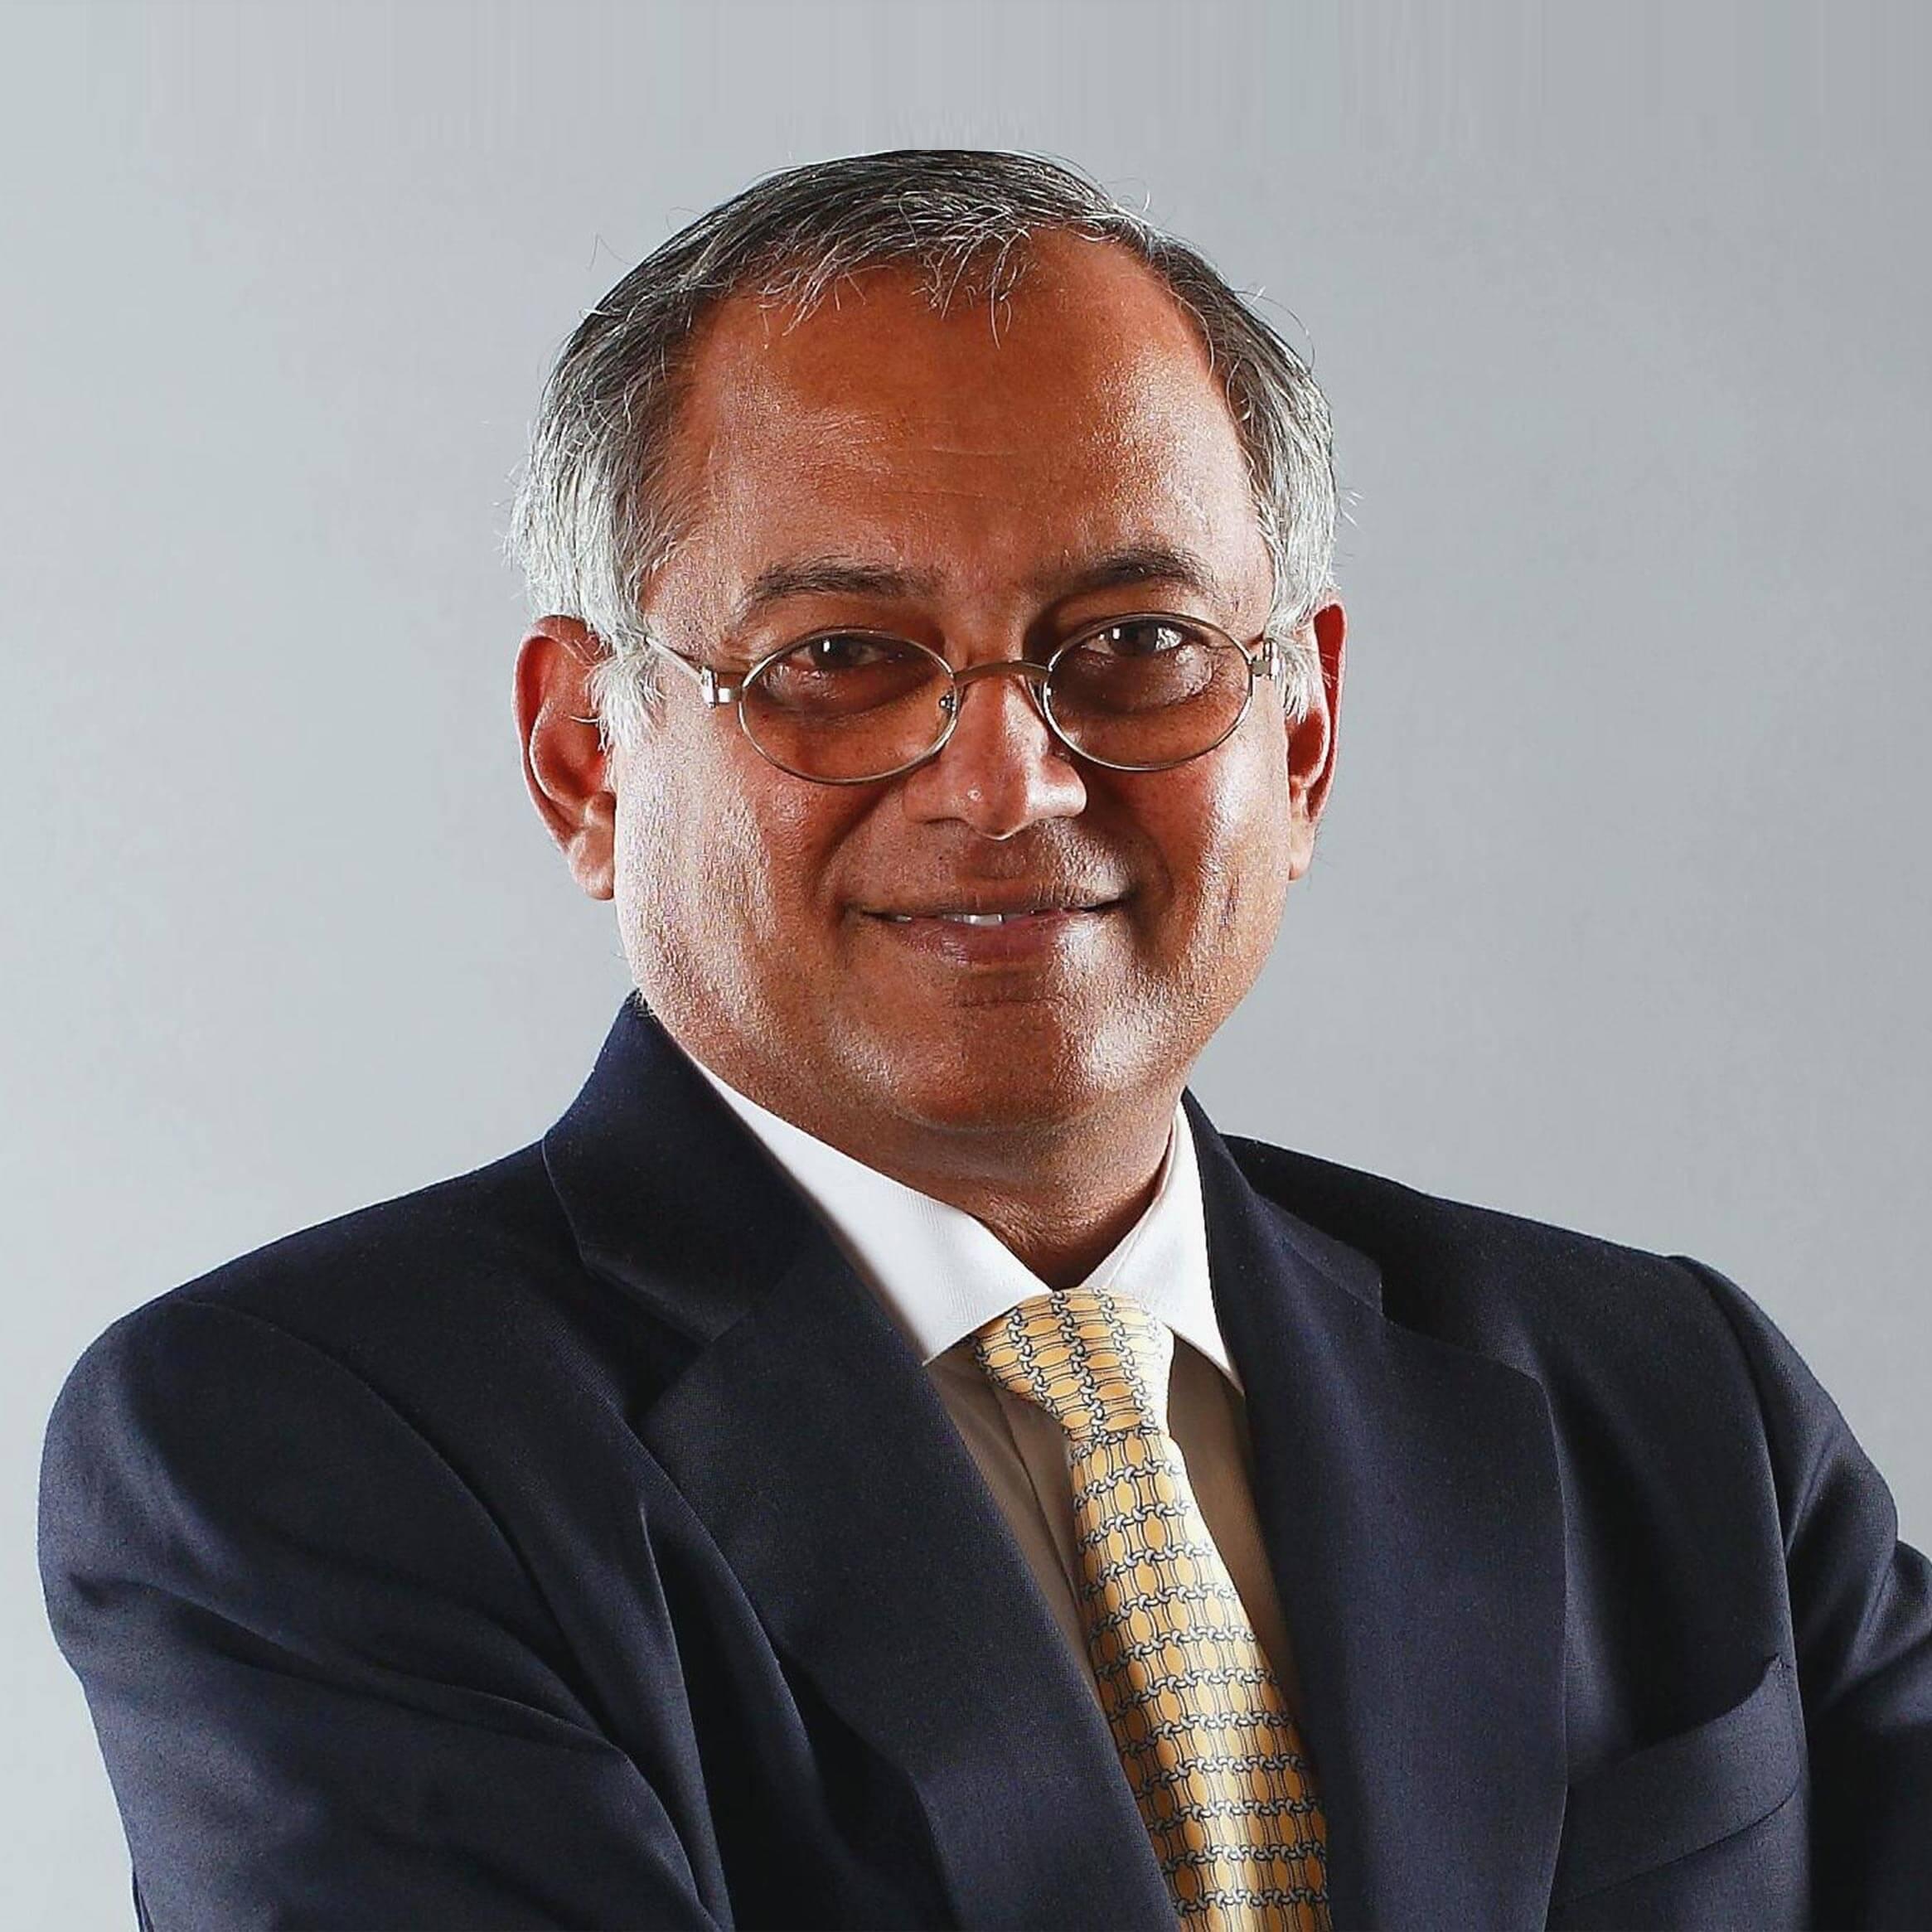 Mr. Venu Srinivasan - Chairman